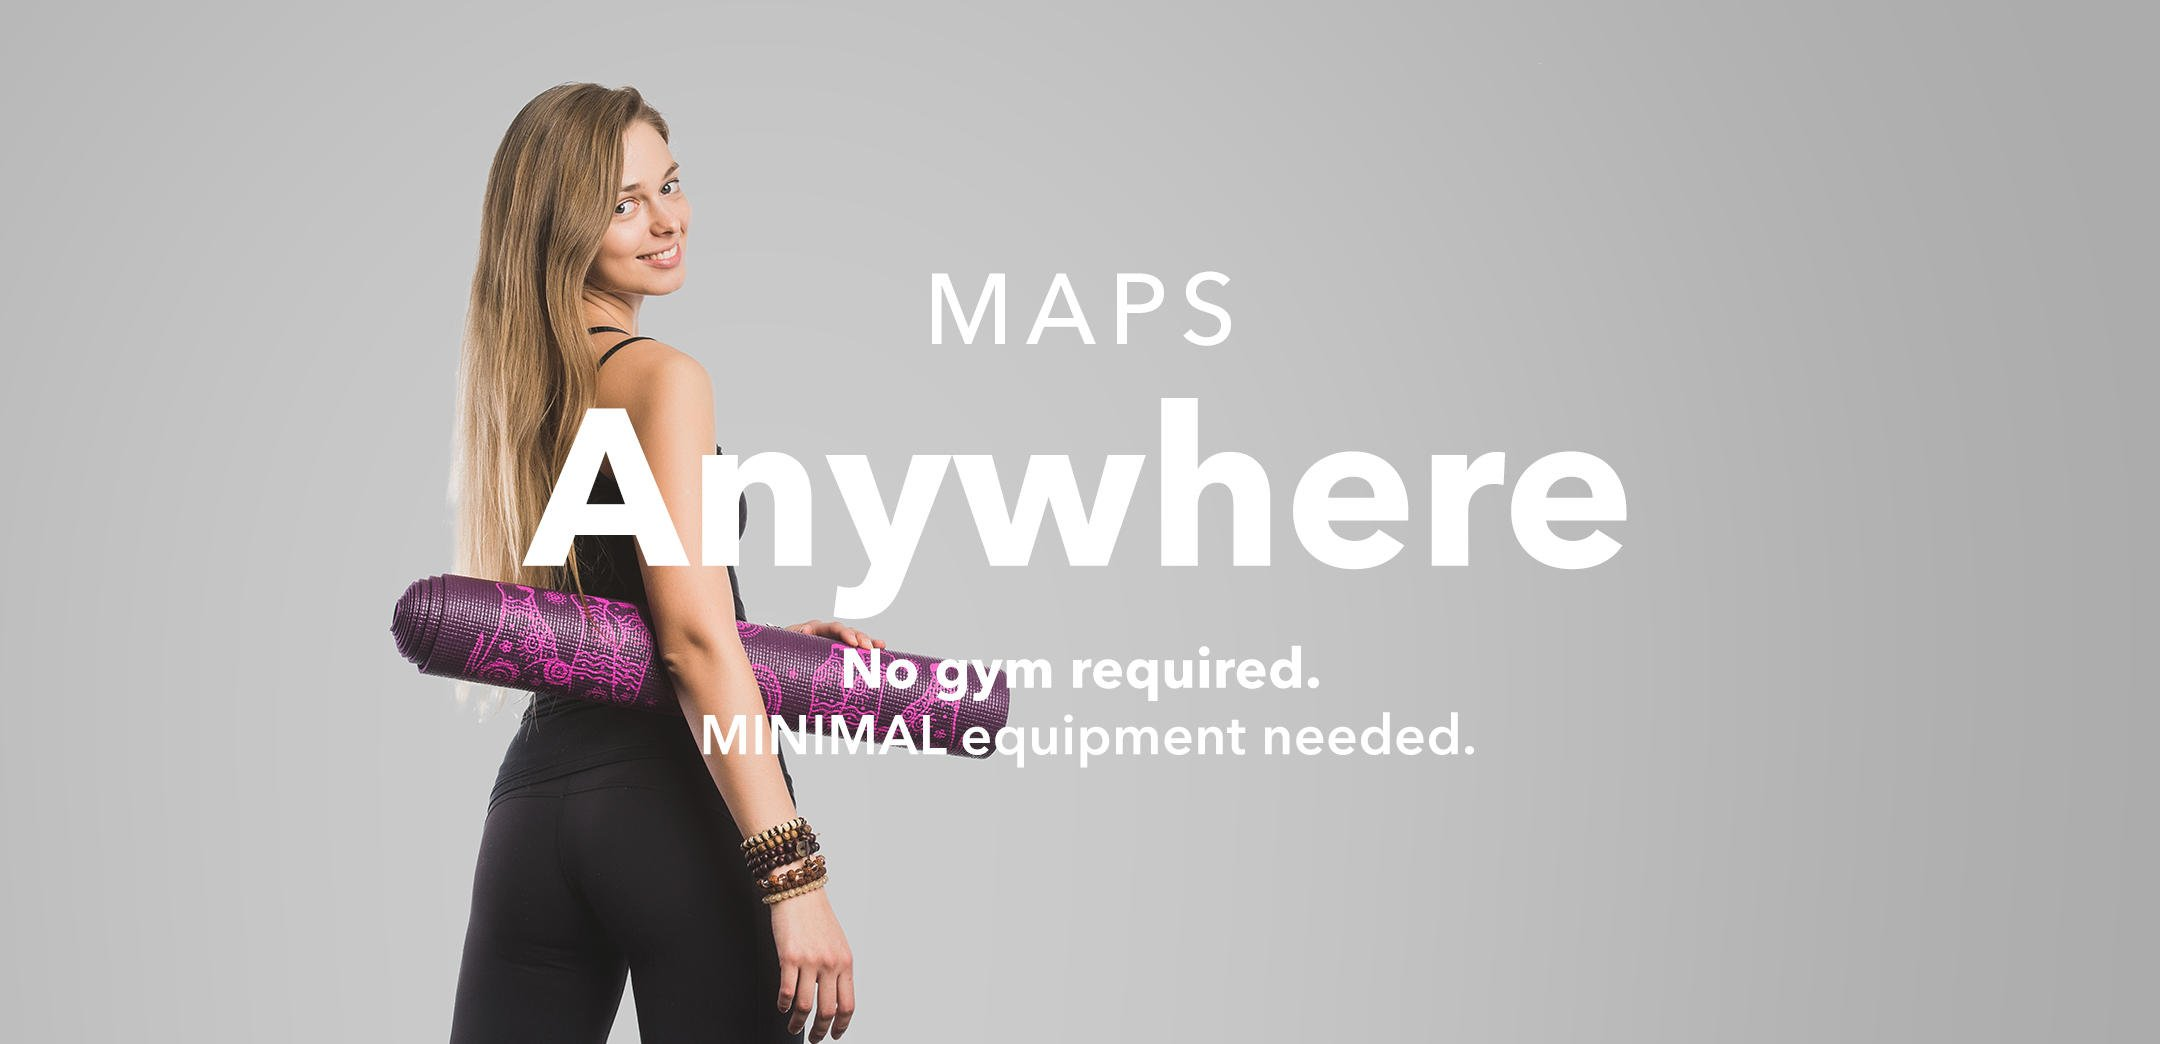 Maps-Anywhere-image